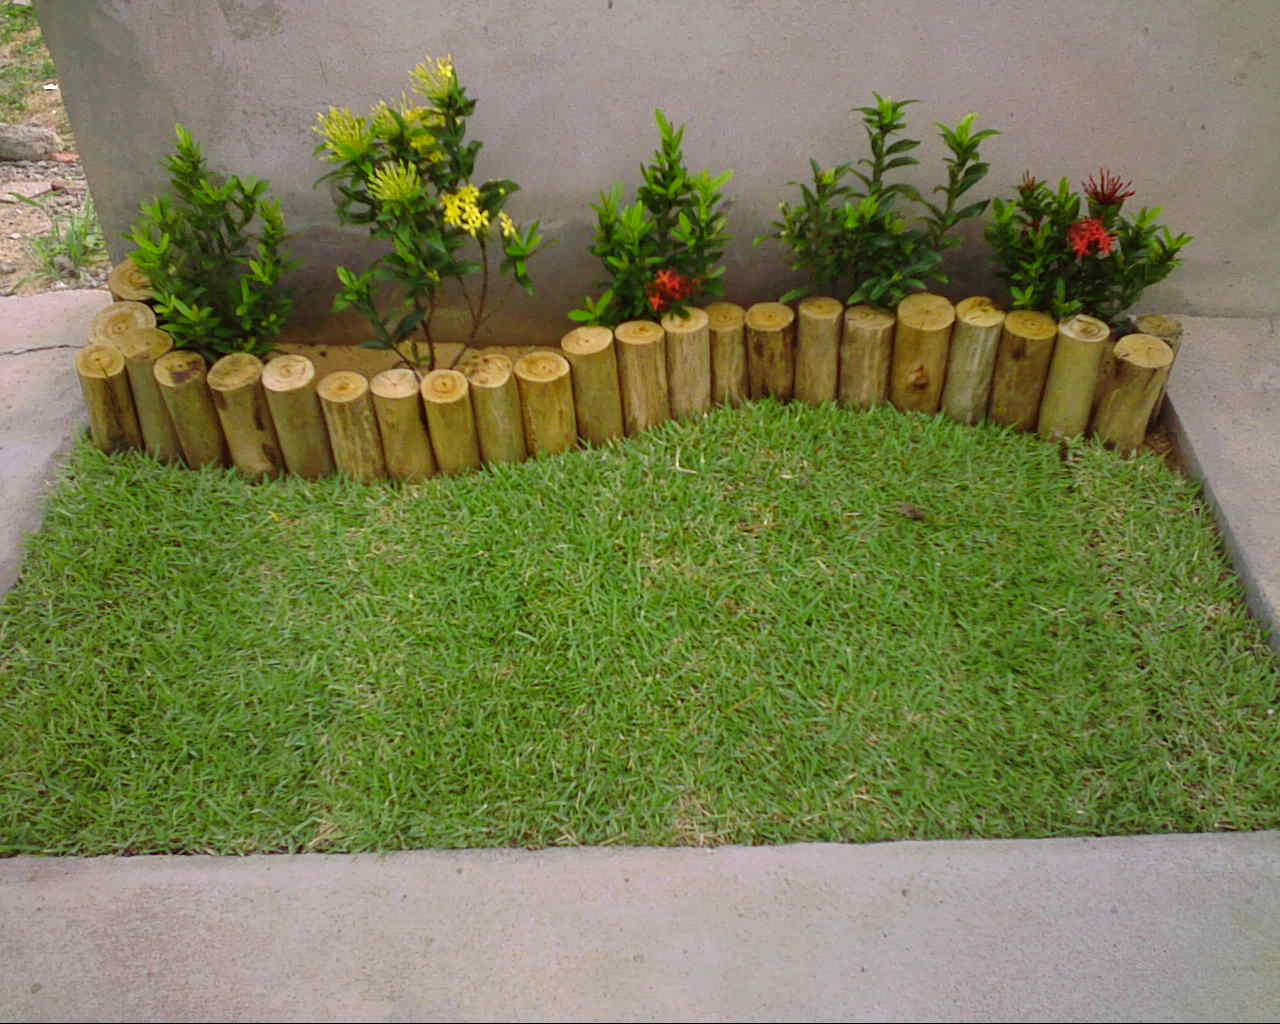 imagens paisagismo jardins : imagens paisagismo jardins:Ideas Para Jardines Pequenos